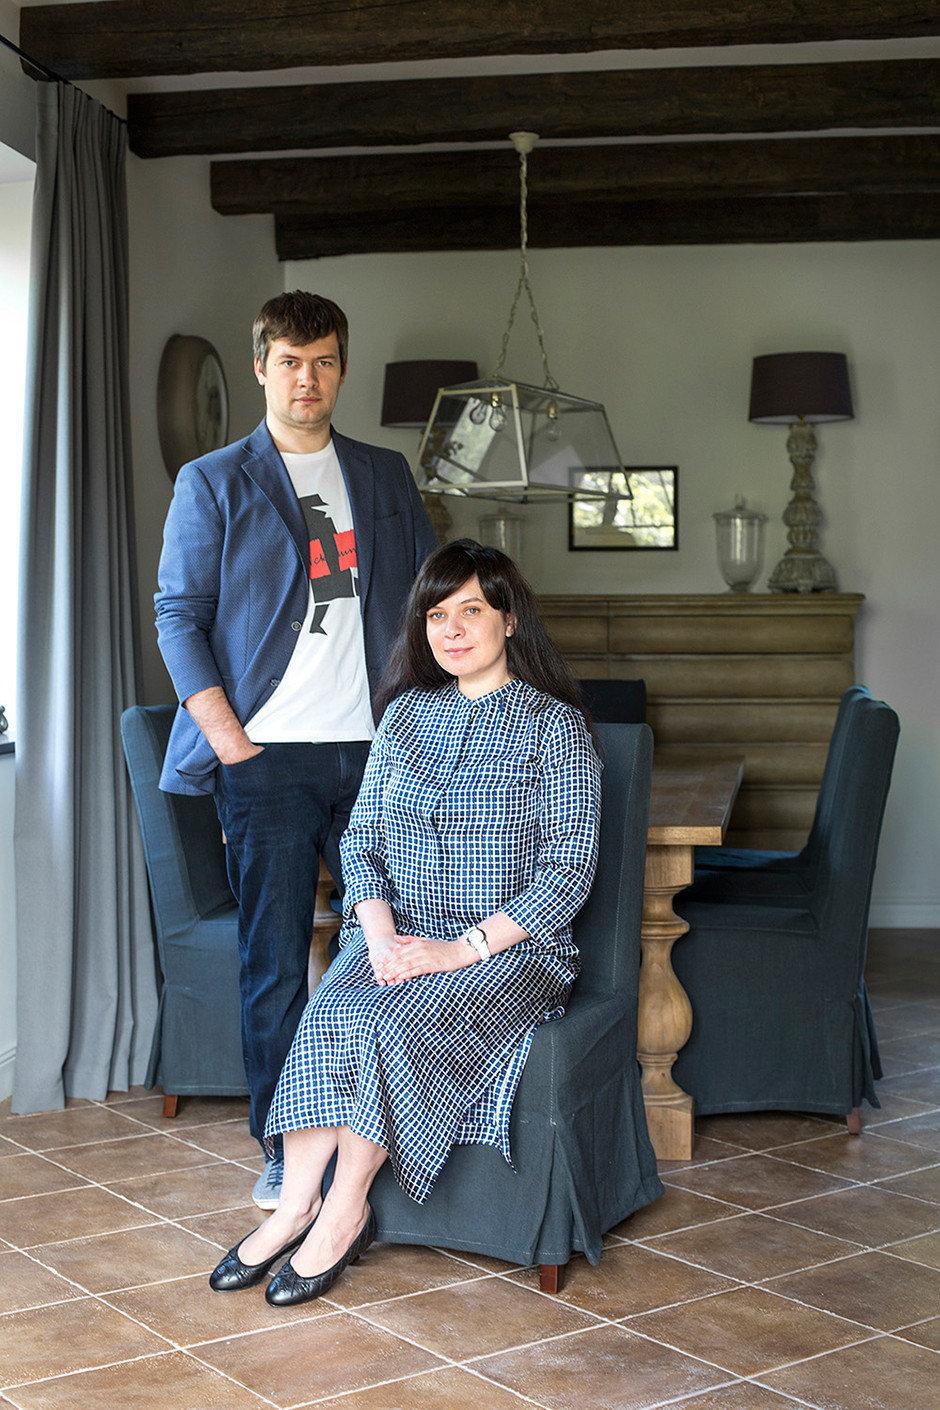 Архитекторы Максим Бондаренко и Надежда Малых